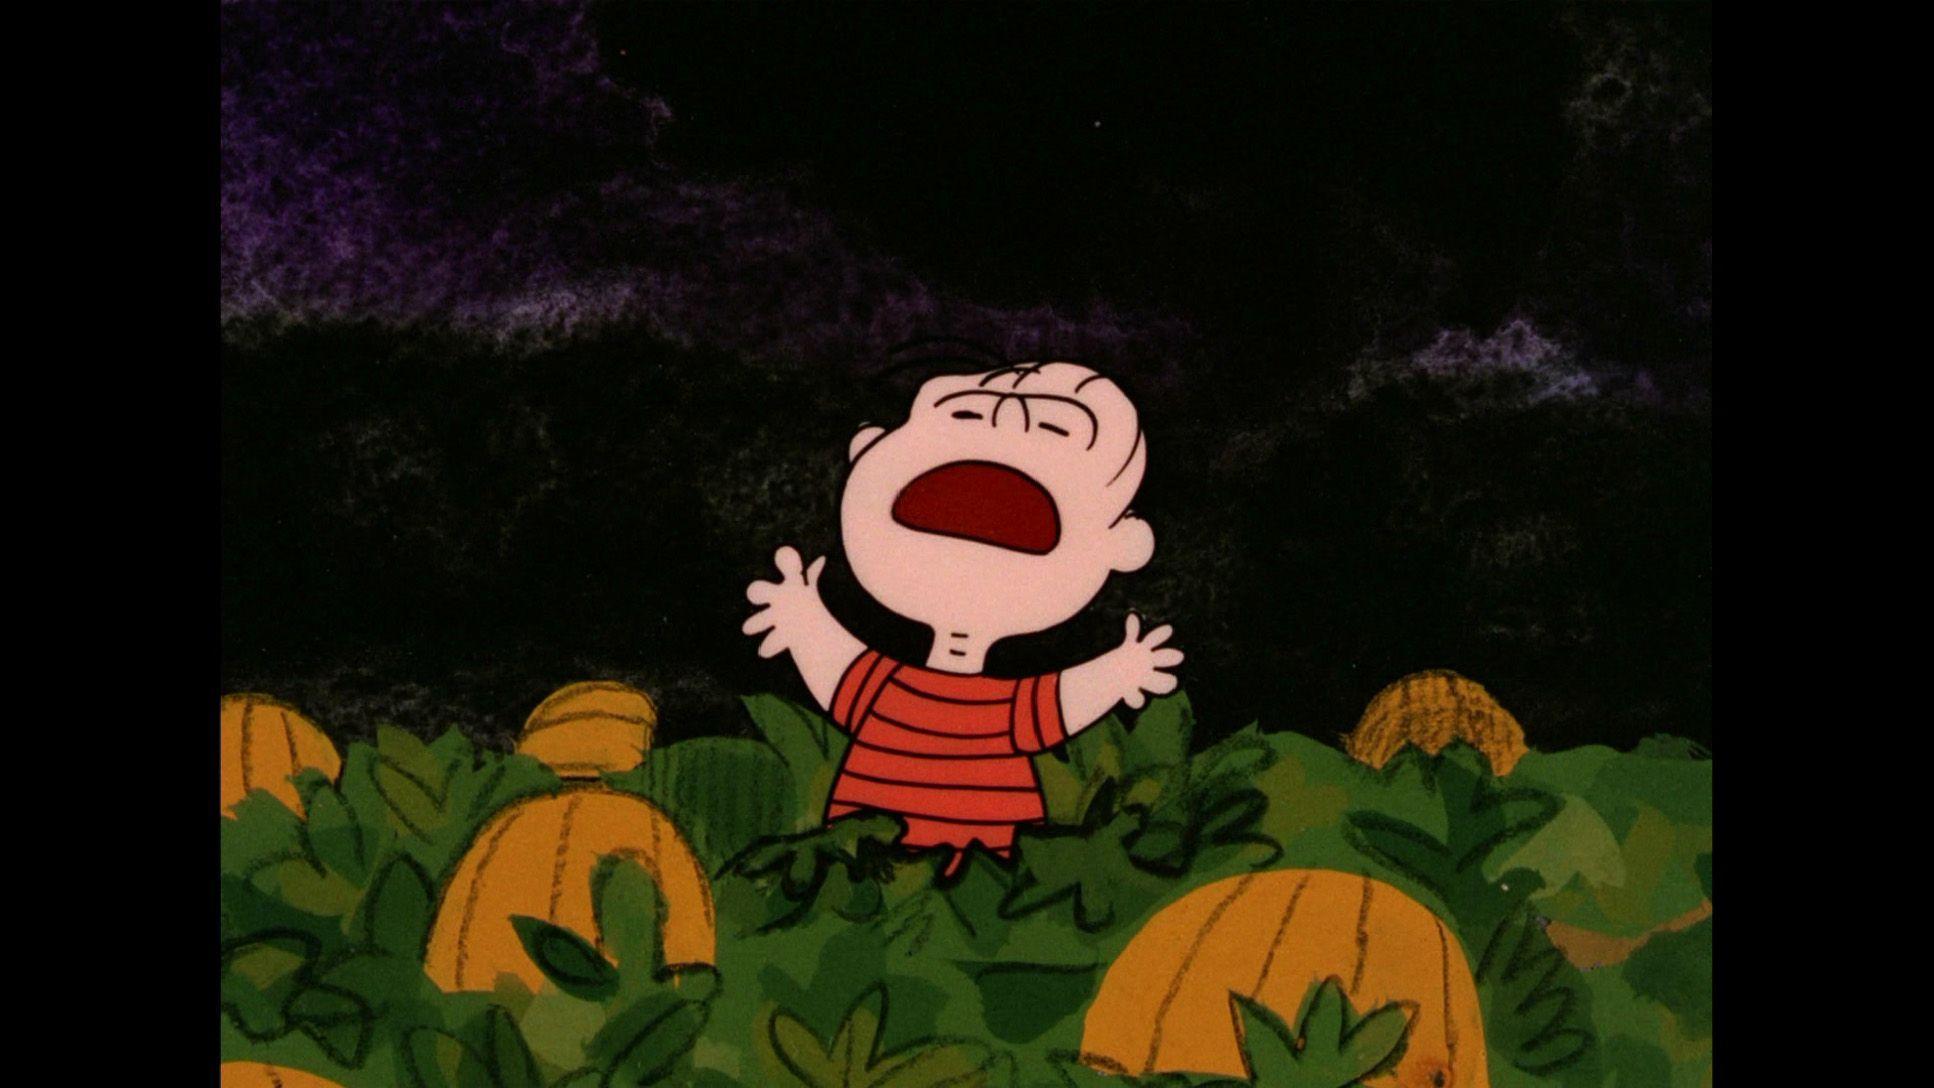 Peanuts Wallpaper Fall Great Pumpkin Charlie Brown Wallpapers Wallpaper Cave